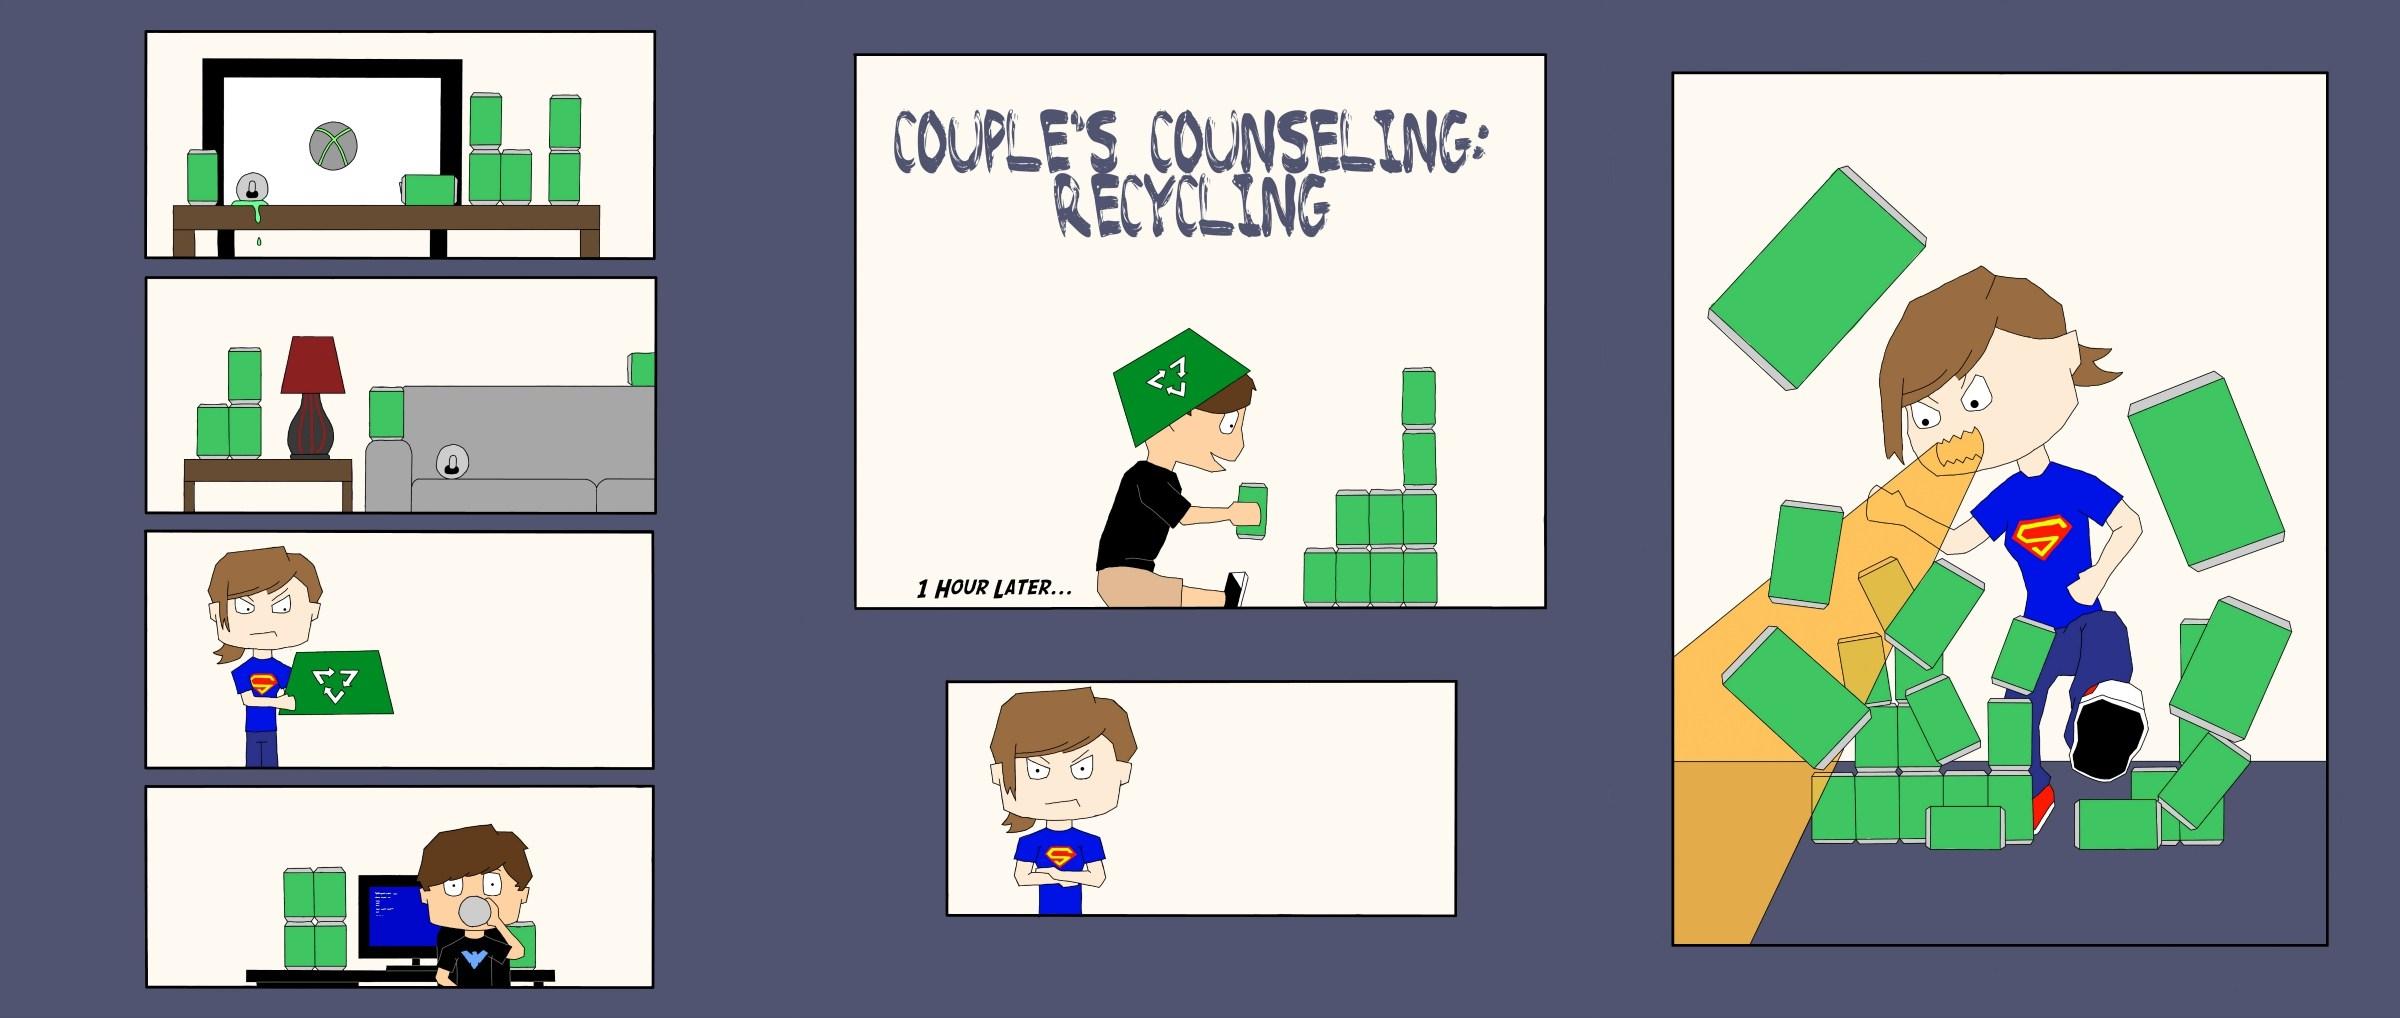 CC5 - Recycling (2014)